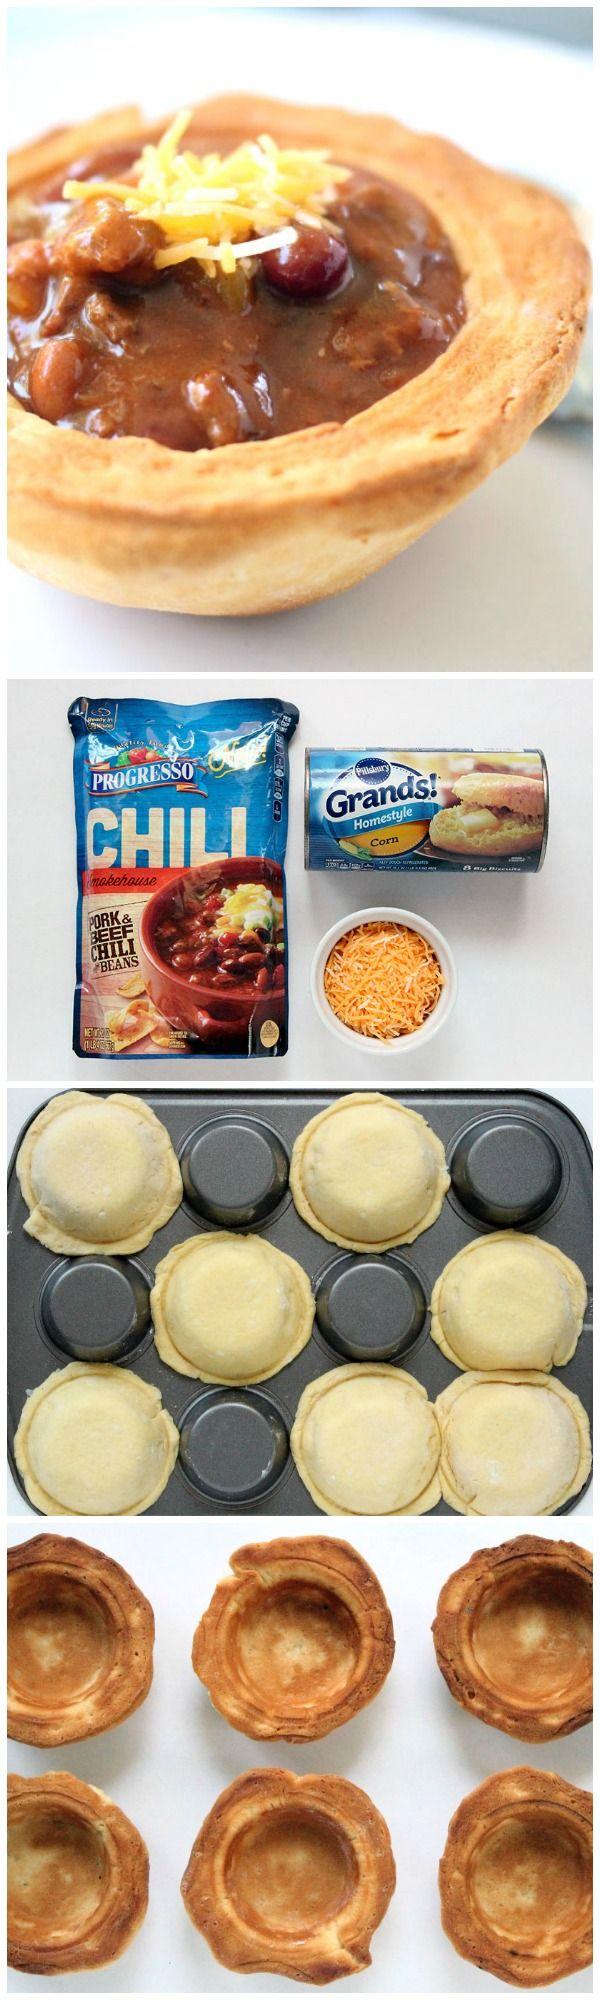 3-Ingredient Cornbread Biscuit Bowls - ready to go in 25 mins!